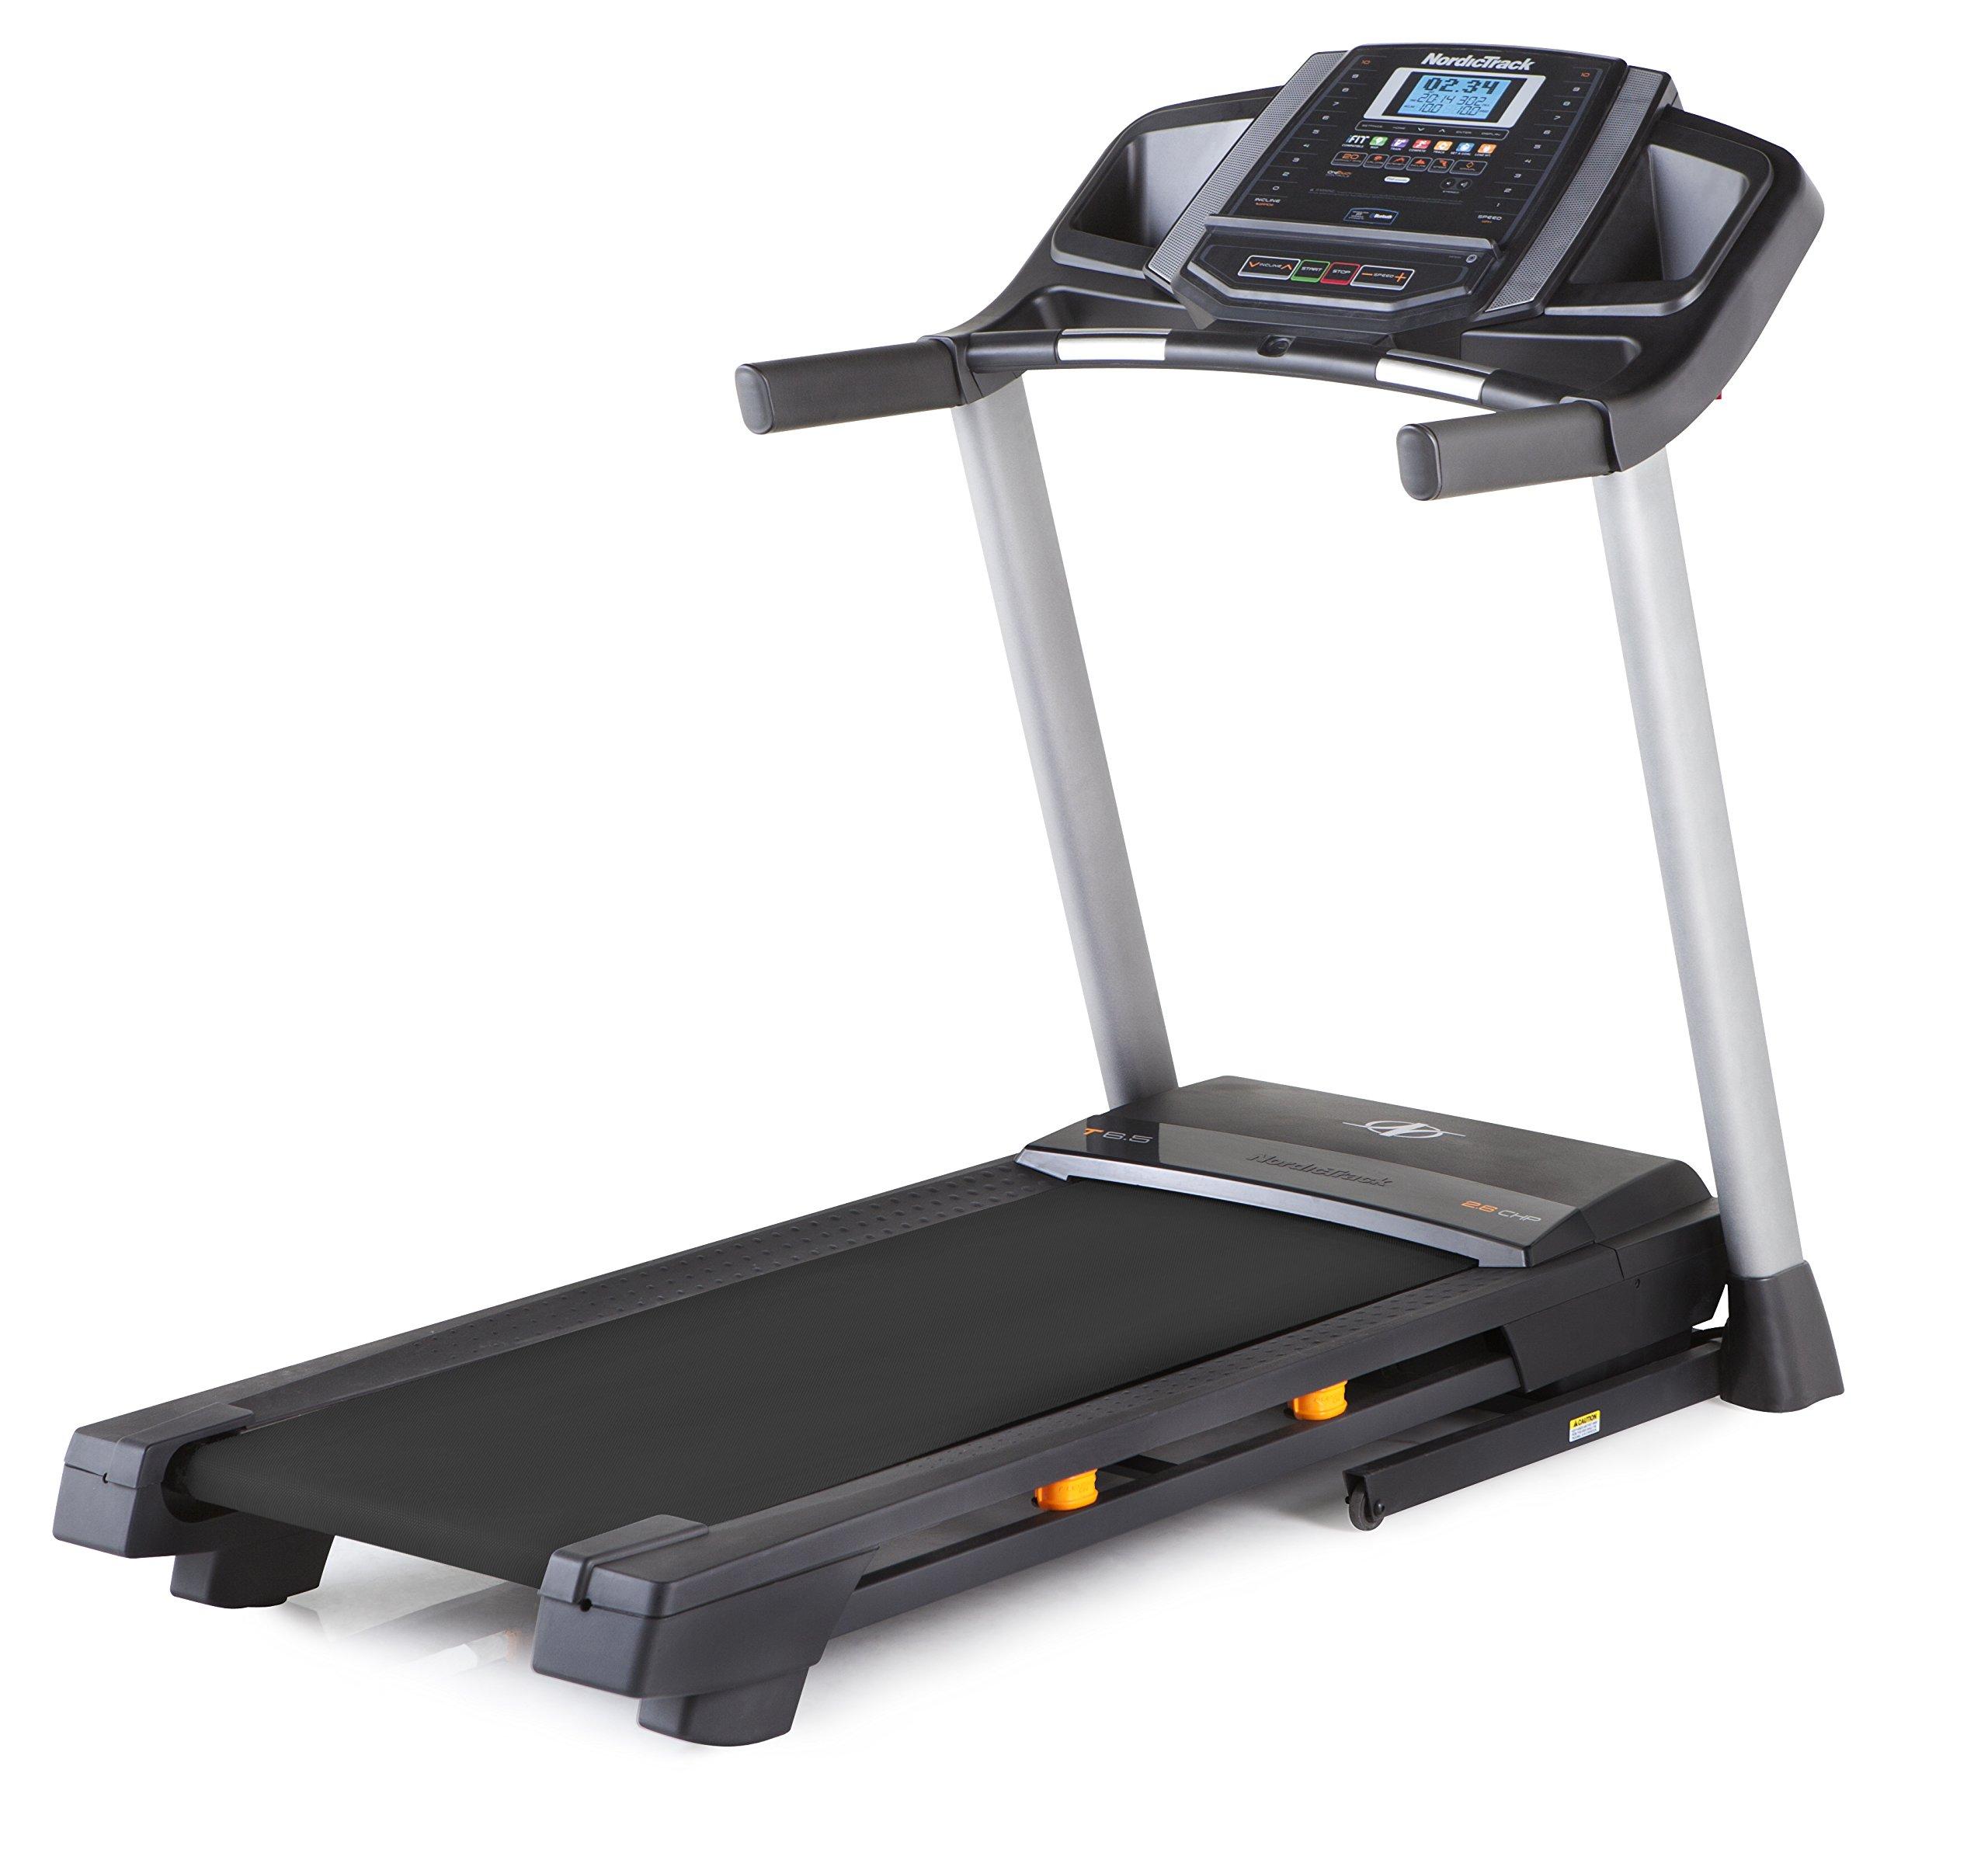 best manual treadmill for running amazon com rh amazon com Small Manual Treadmills Iron Man Manual Treadmill Edge